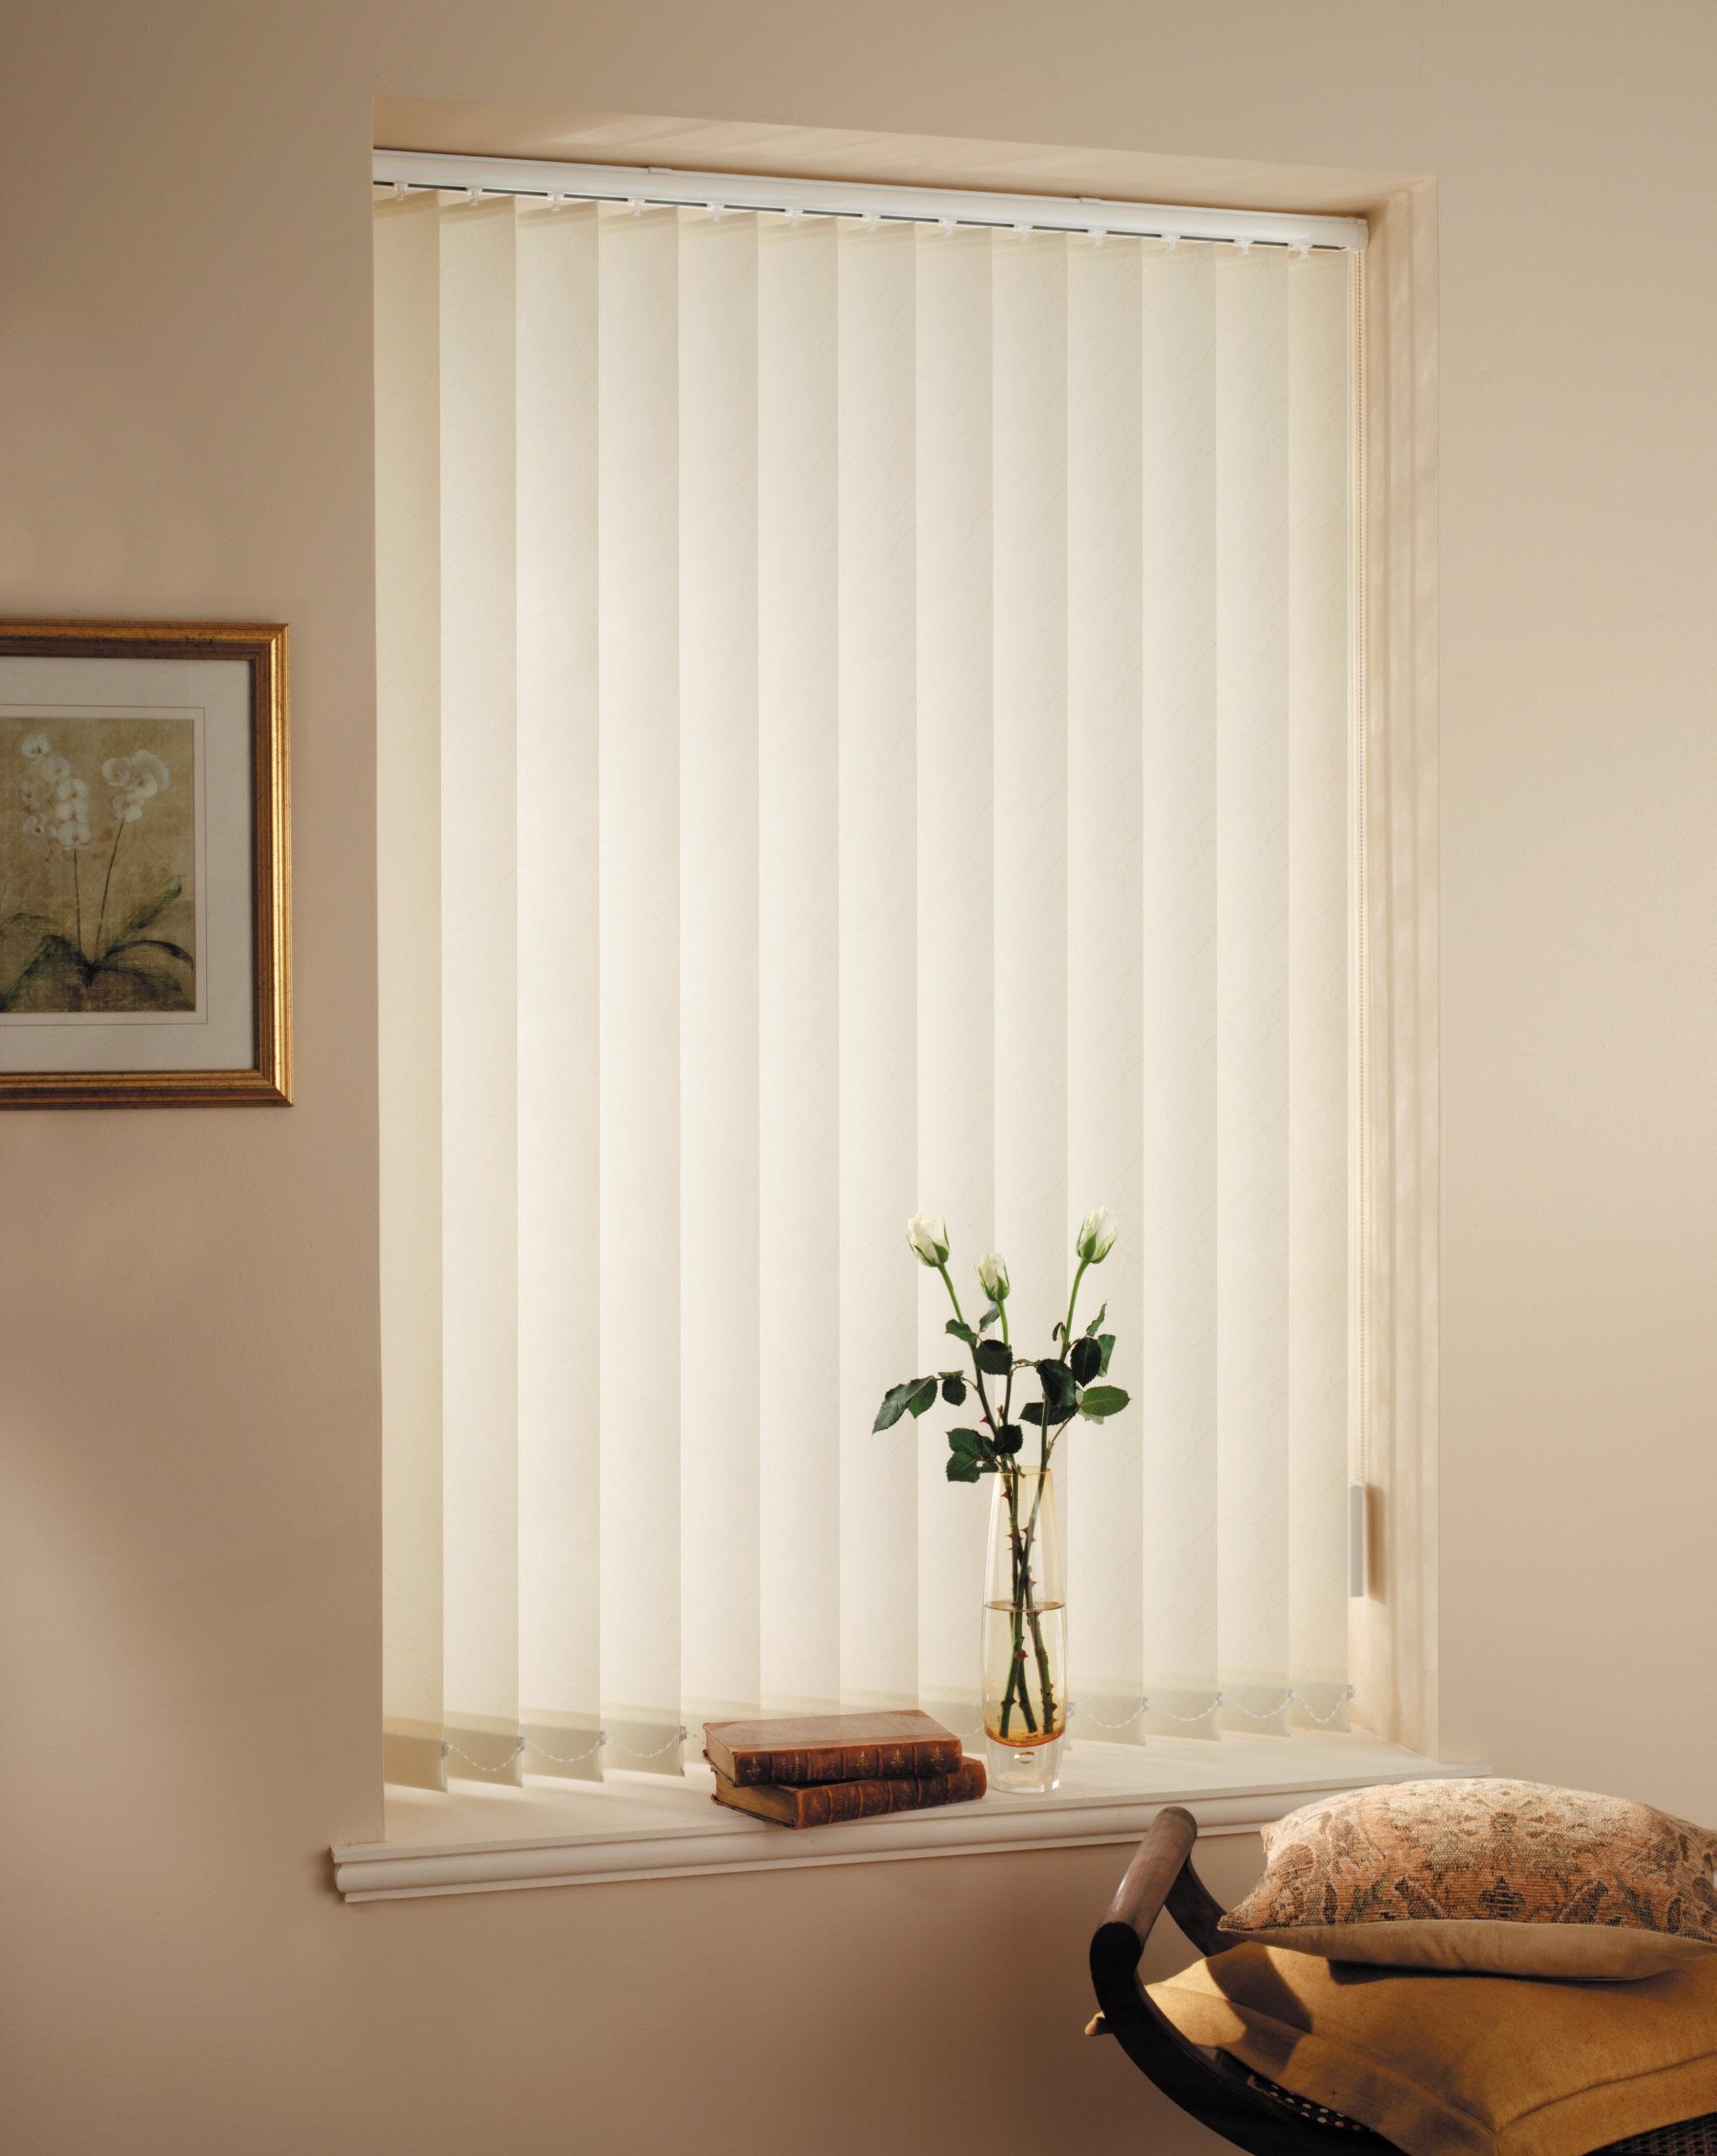 Vertical blinds -1